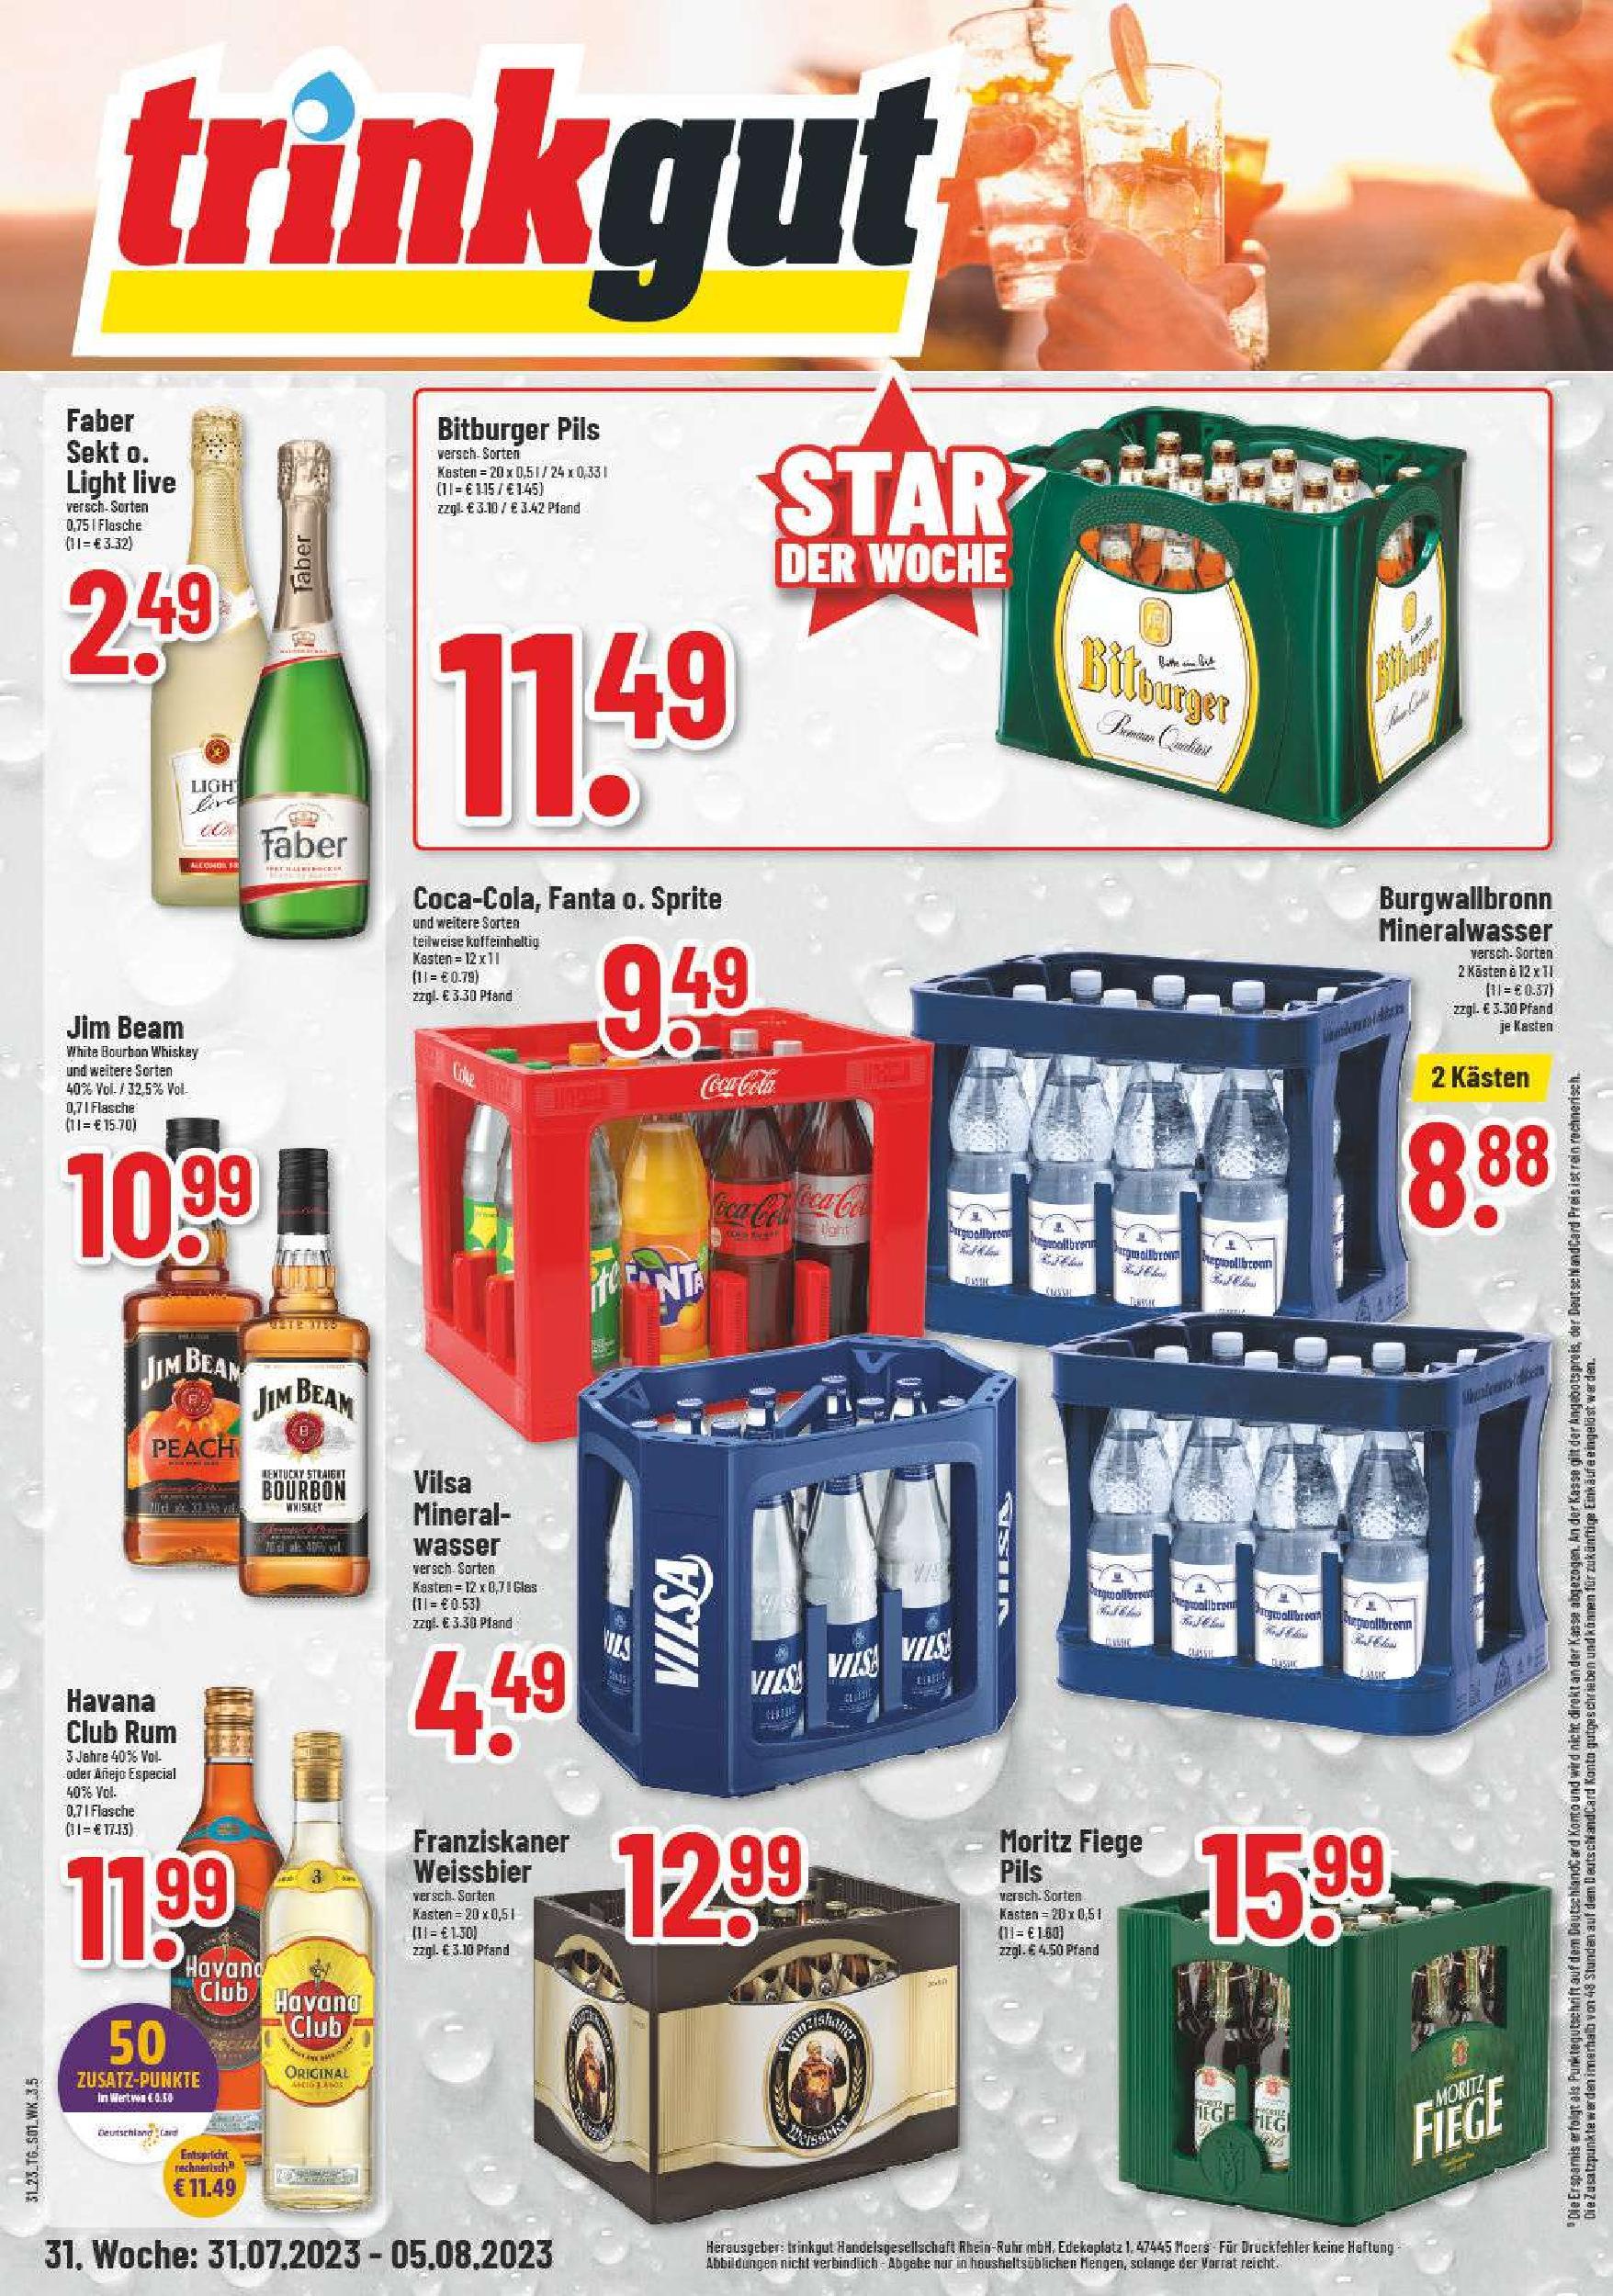 Angebote & Aktionen - trinkgut Getränkemarkt Dülmen Coesfeld Datteln